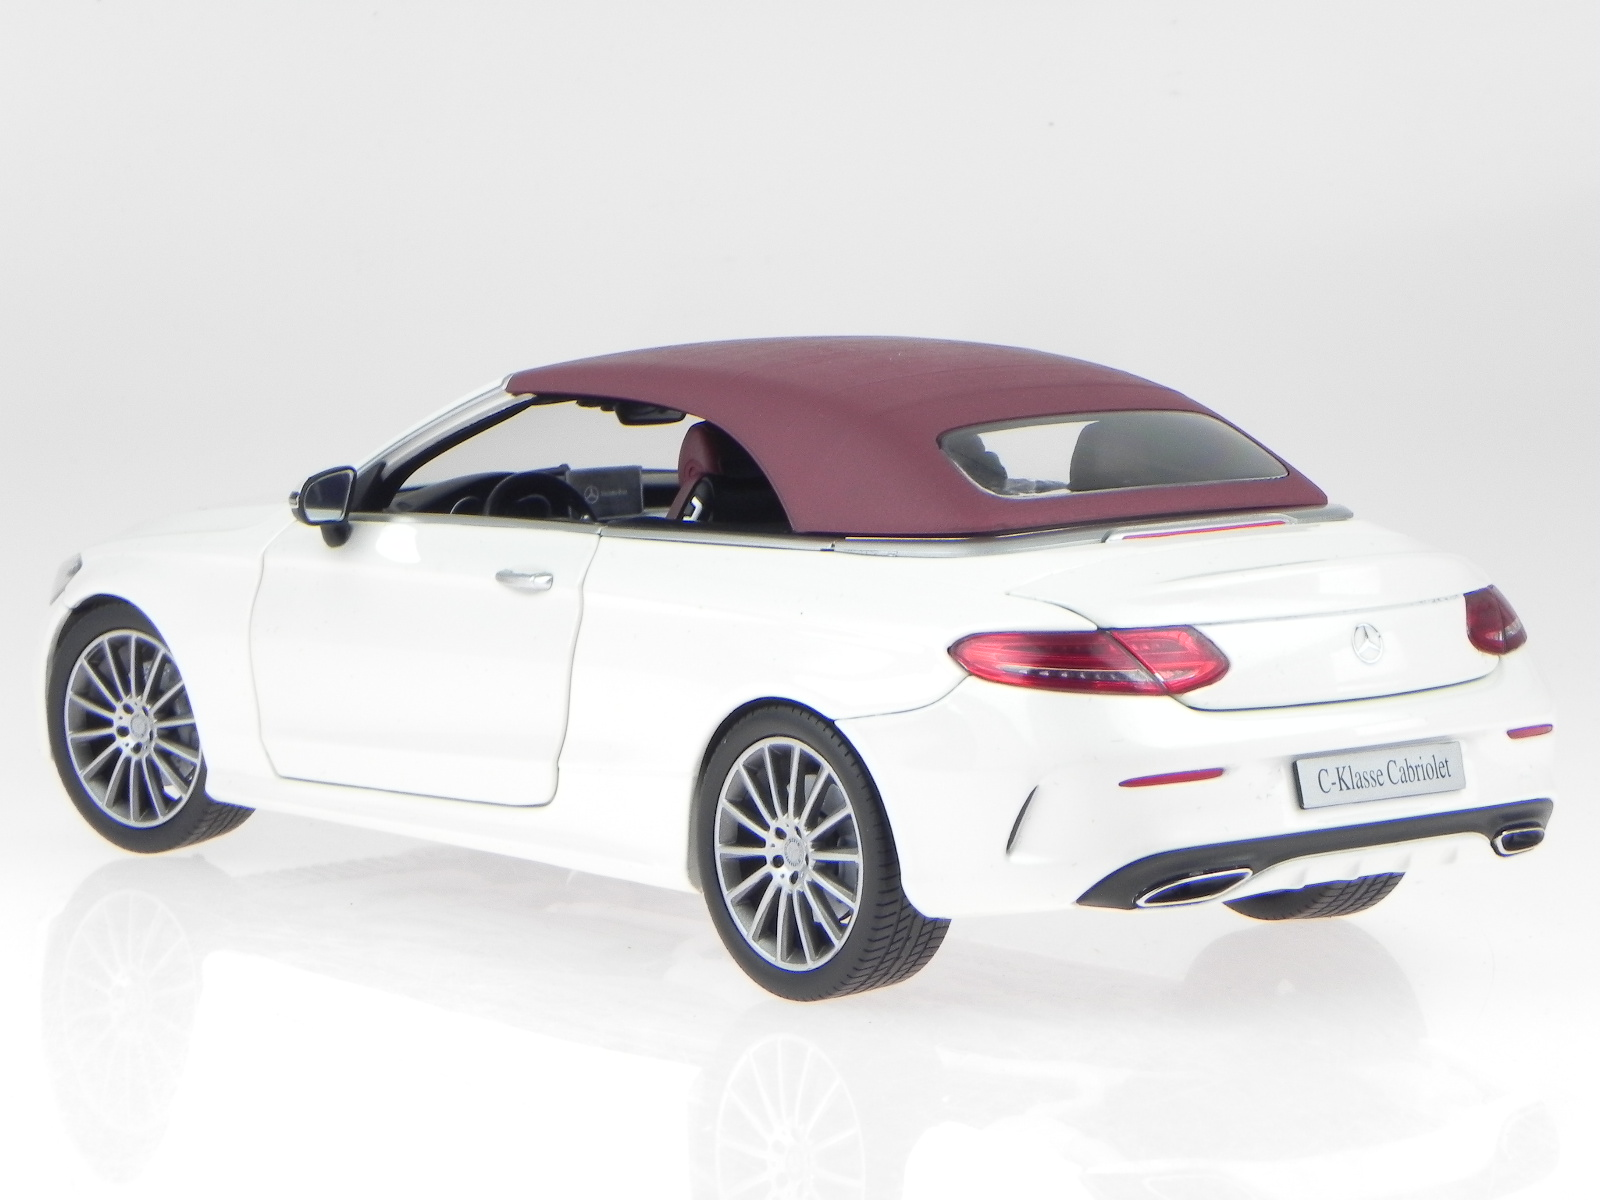 mercedes a205 c klasse cabrio diamant weiss modellauto. Black Bedroom Furniture Sets. Home Design Ideas